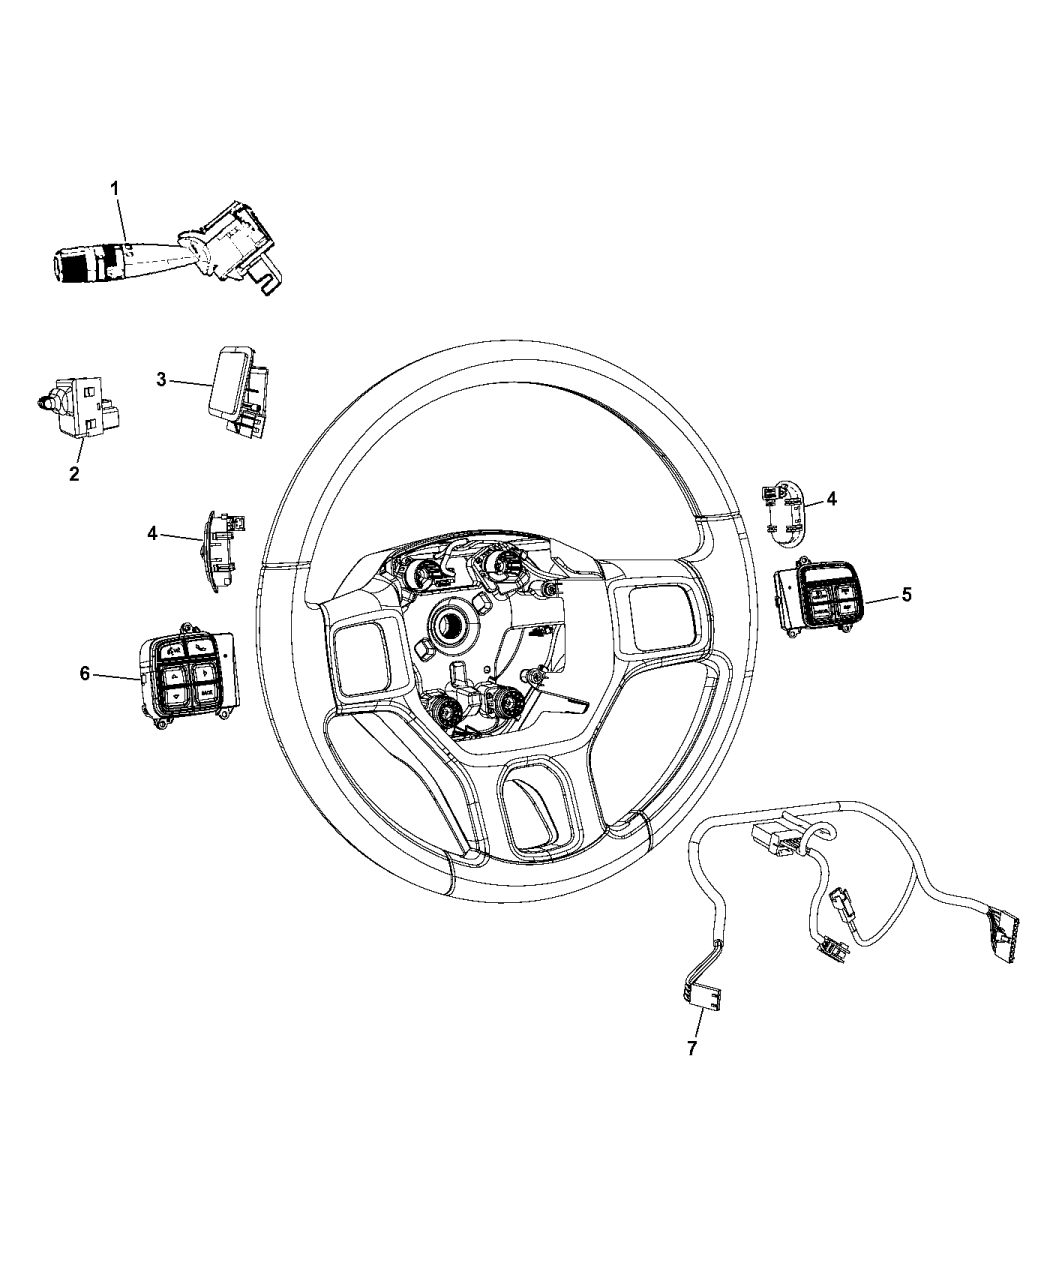 68111384AB - Genuine Mopar SWITCH-SPEED CONTROL